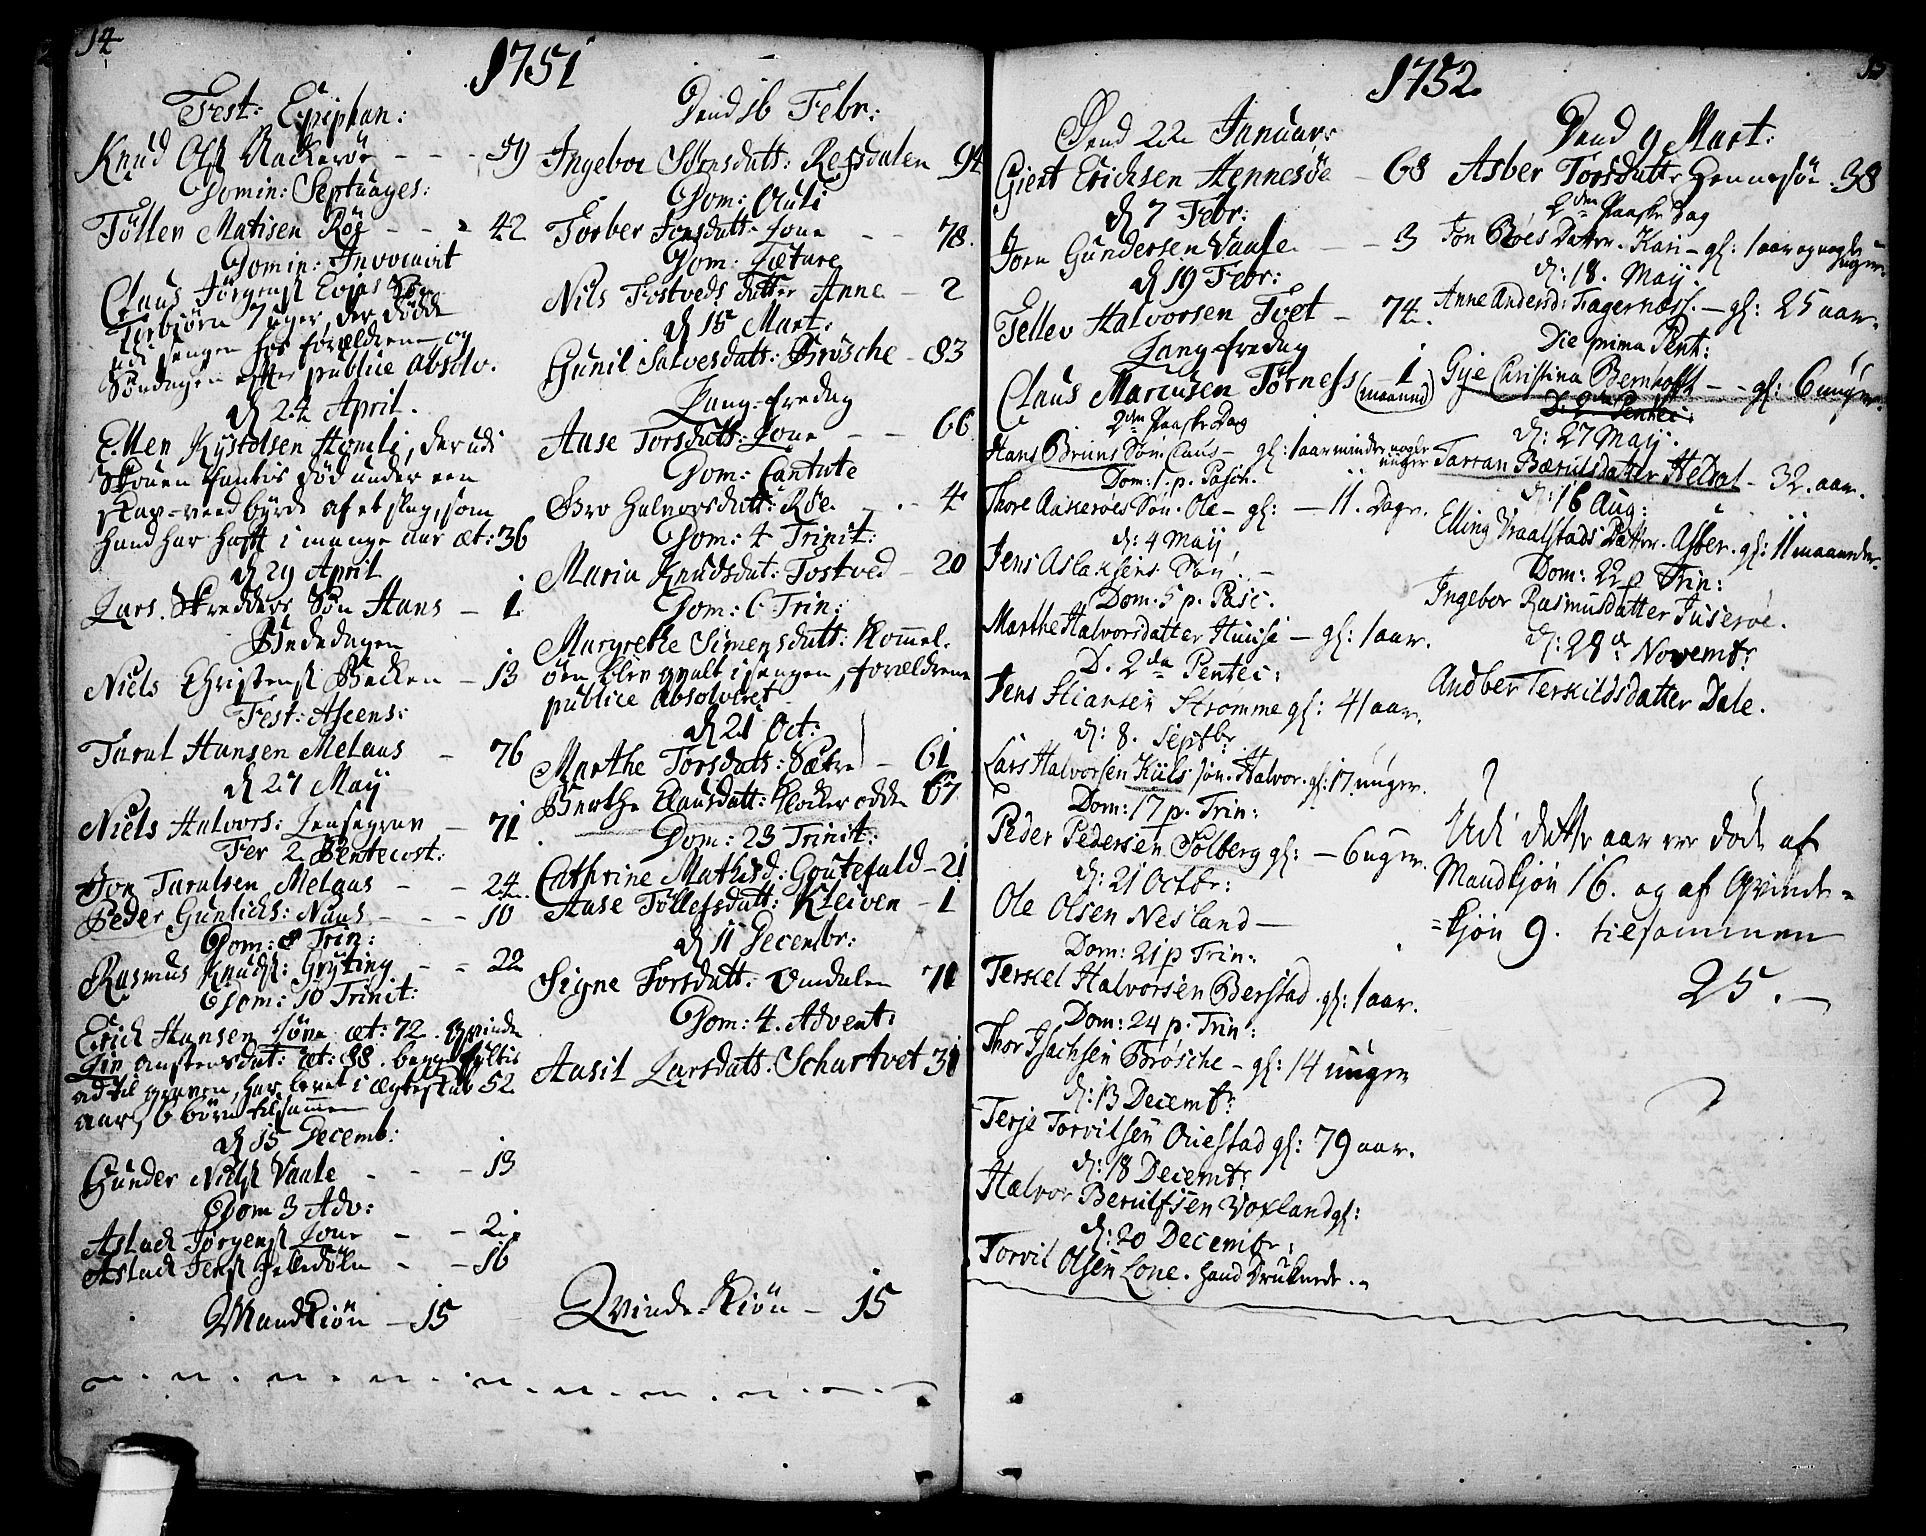 SAKO, Drangedal kirkebøker, F/Fa/L0001: Ministerialbok nr. 1, 1697-1767, s. 14-15